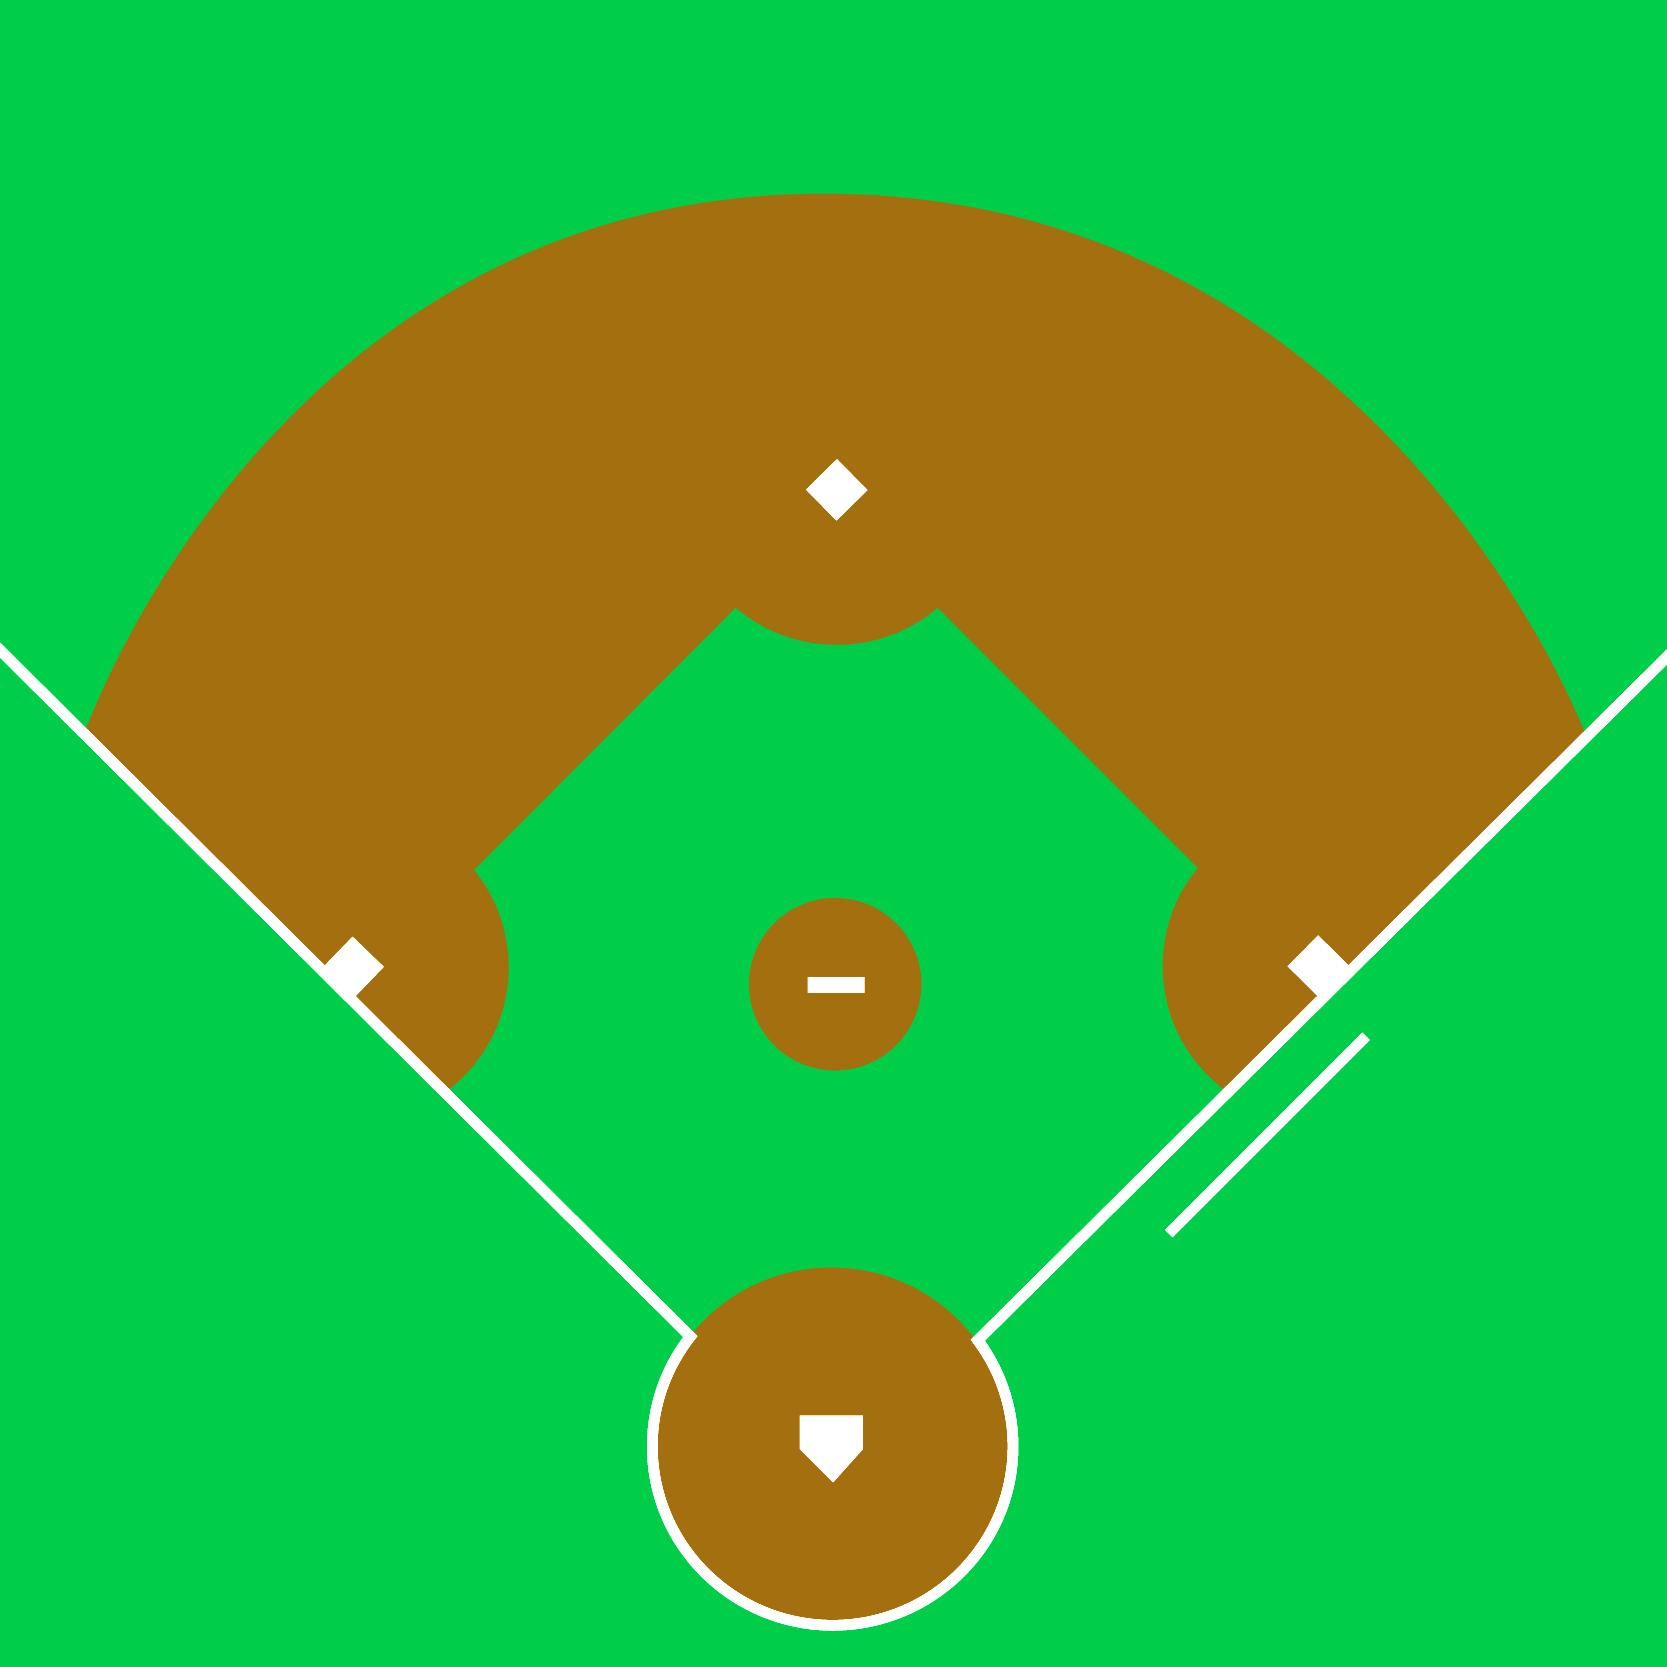 Free Blank Baseball Field Diagram Download Free Clip Art